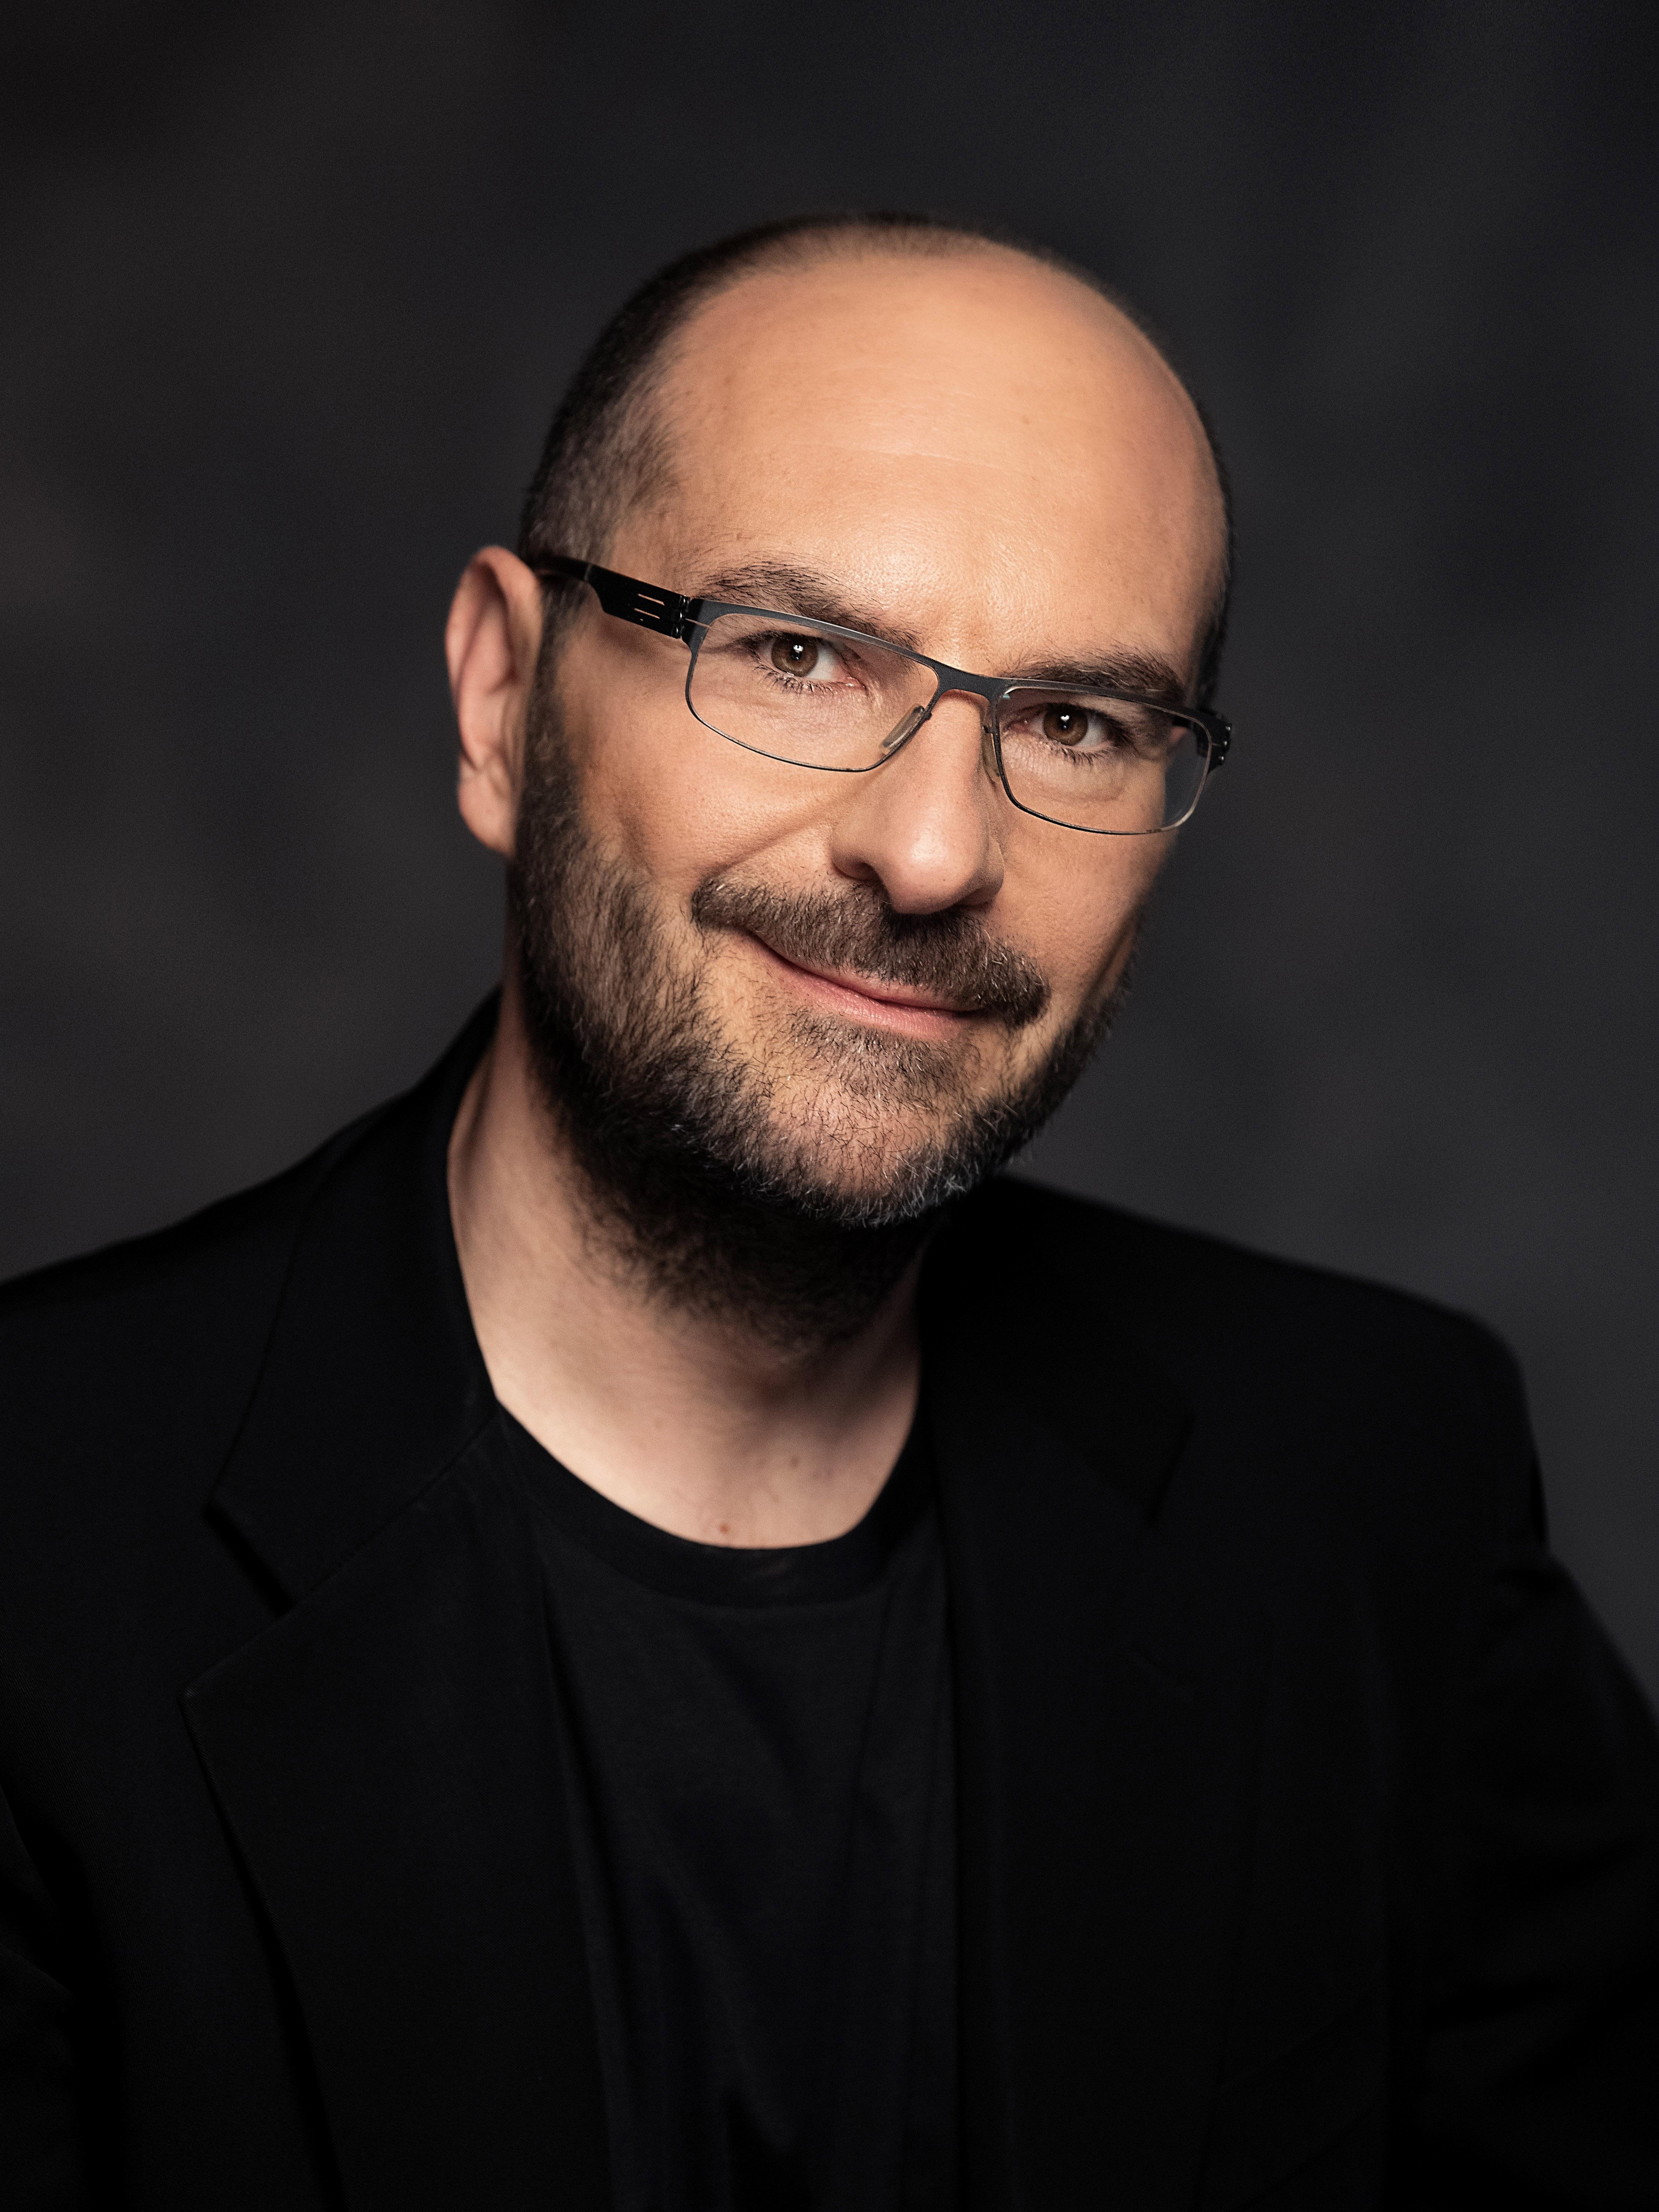 Arleston, directeur éditorial de Drakoo, (Copyright Etienne Clotis)